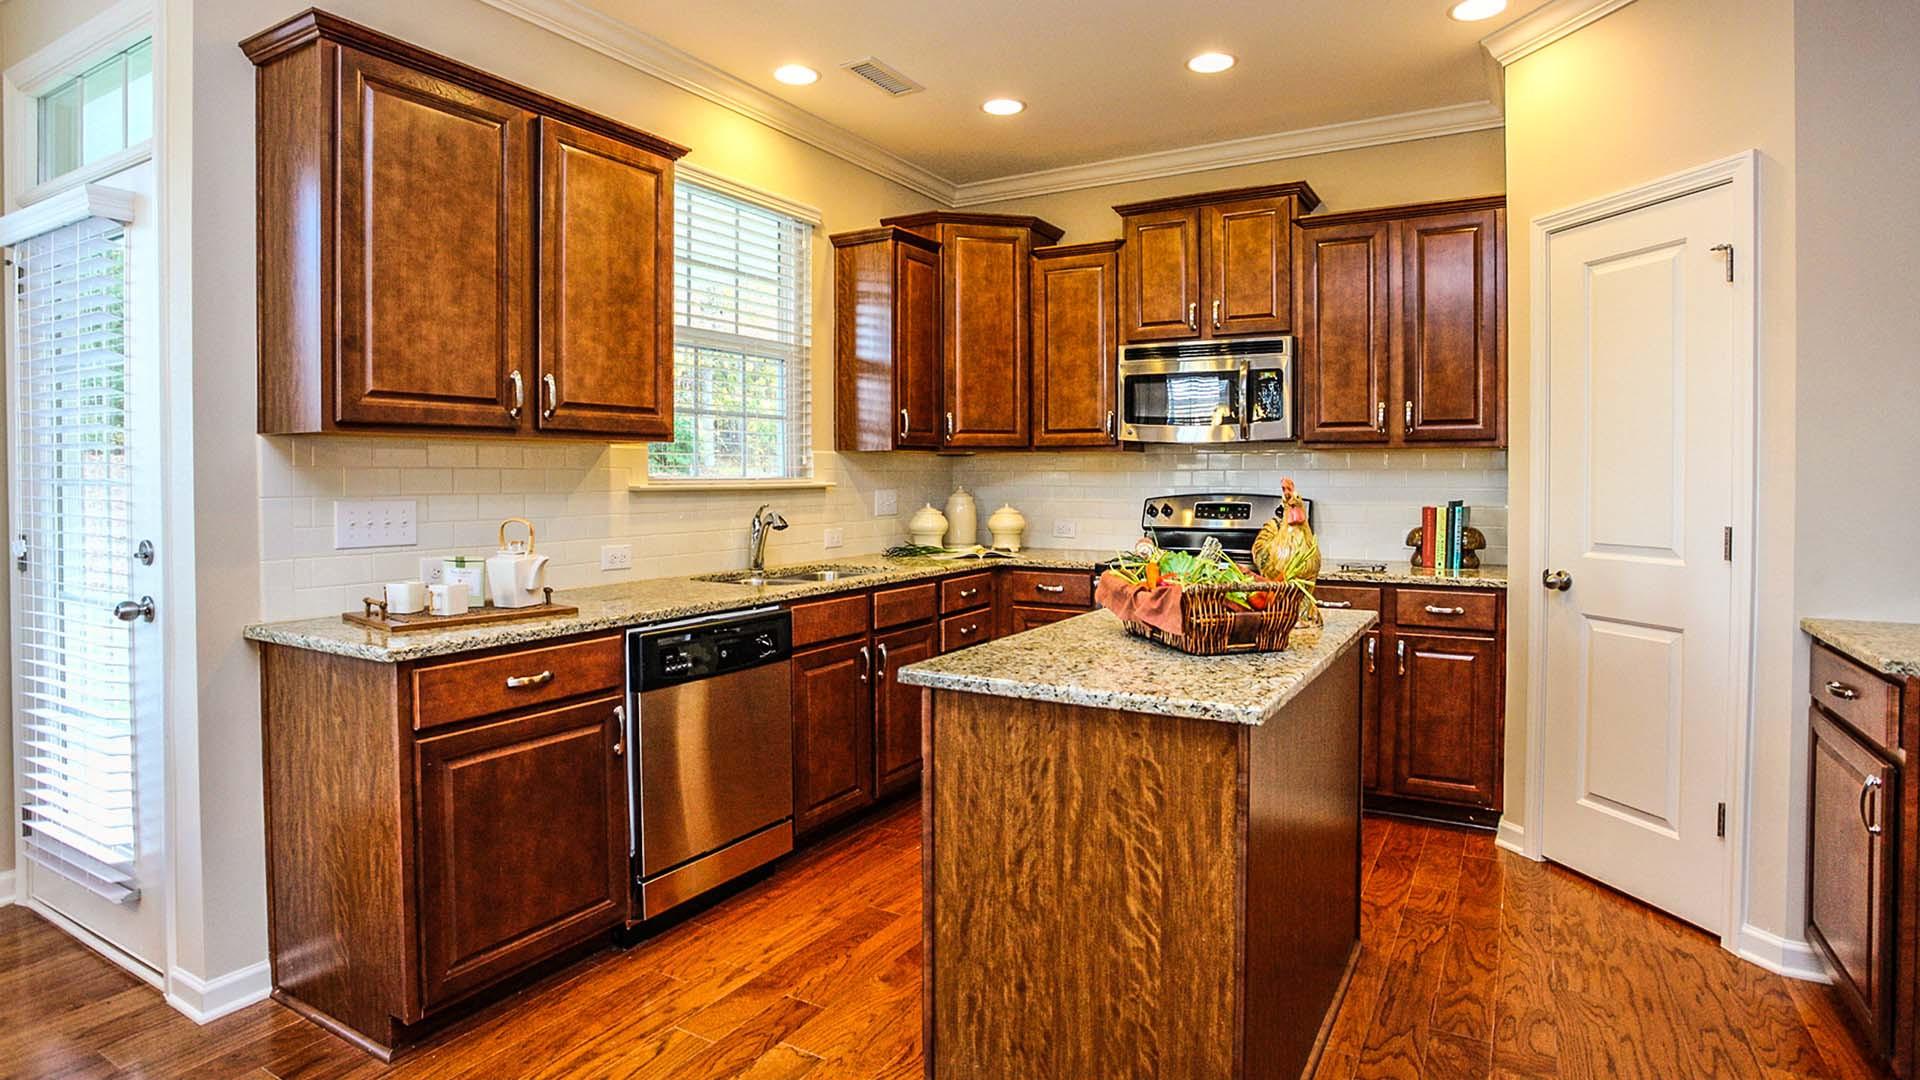 knights hardwood flooring raleigh nc of langston ridge chesapeake homes for langston ridge in knightdale